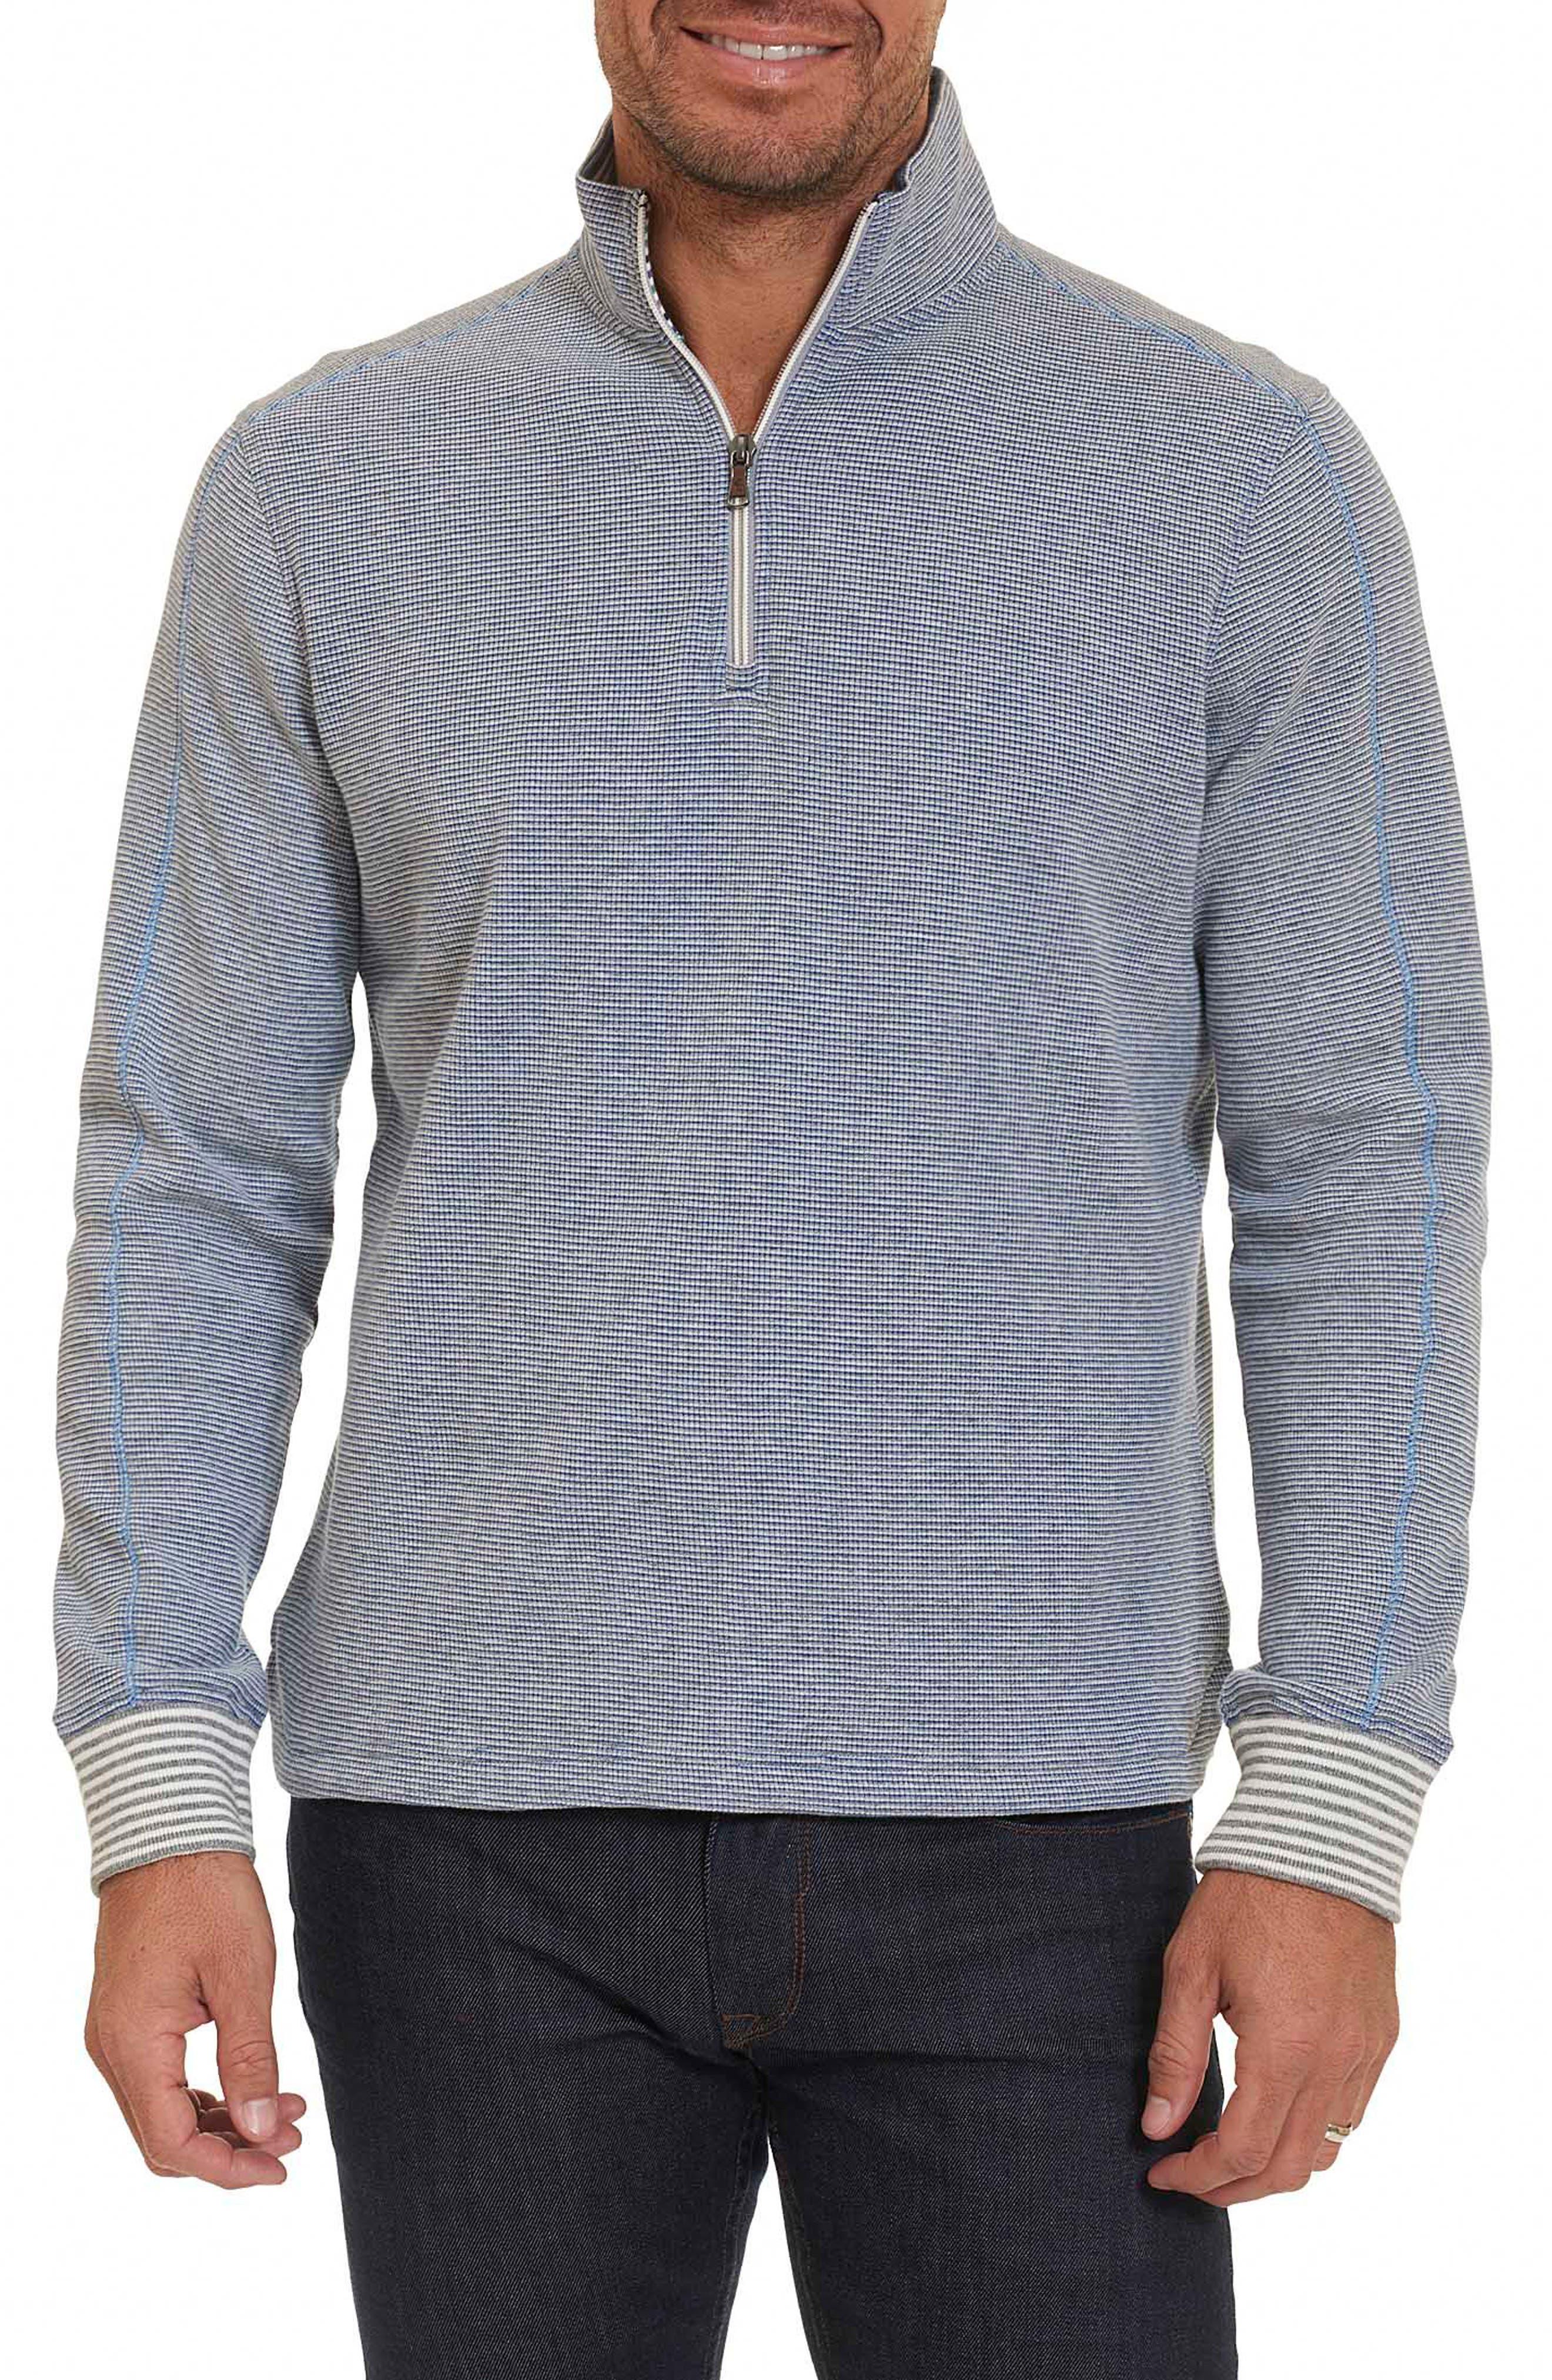 Poole Regular Fit Quarter Zip Pullover,                             Main thumbnail 1, color,                             020